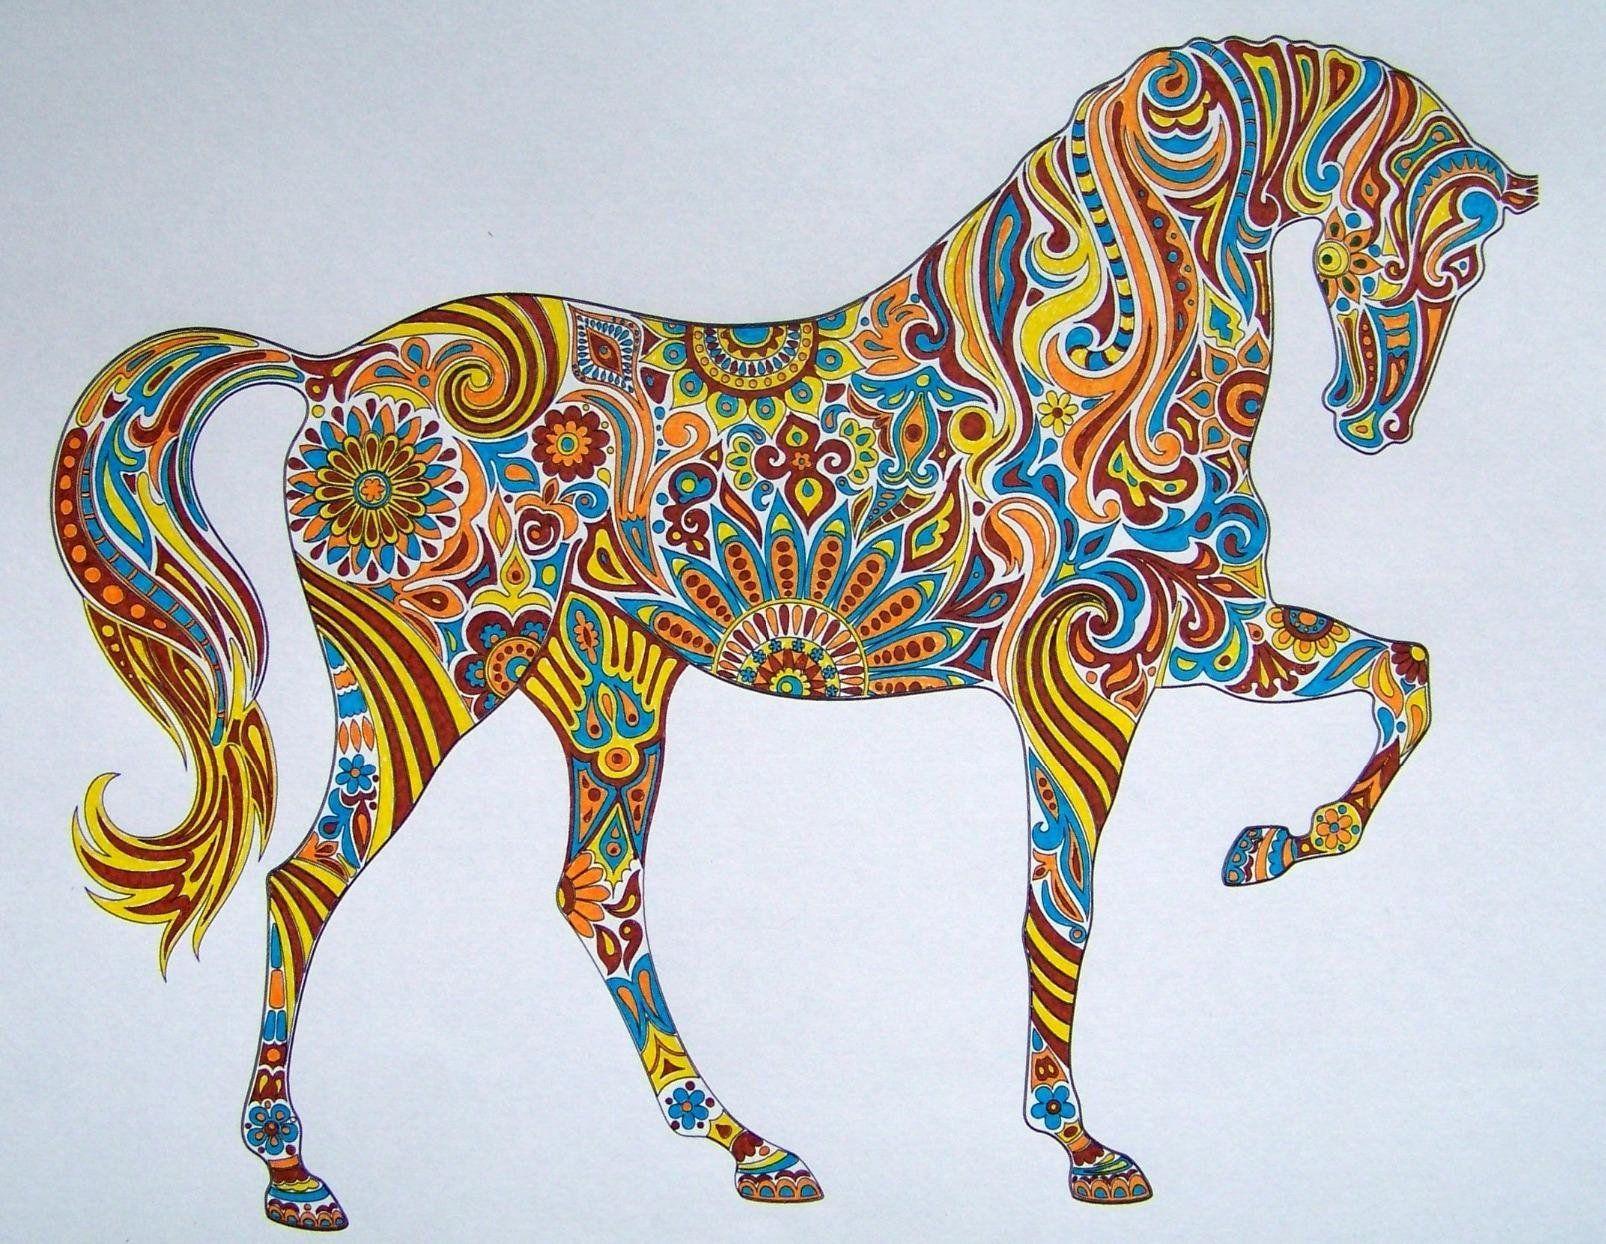 Pin On Art Ideas 2 [ 1244 x 1606 Pixel ]